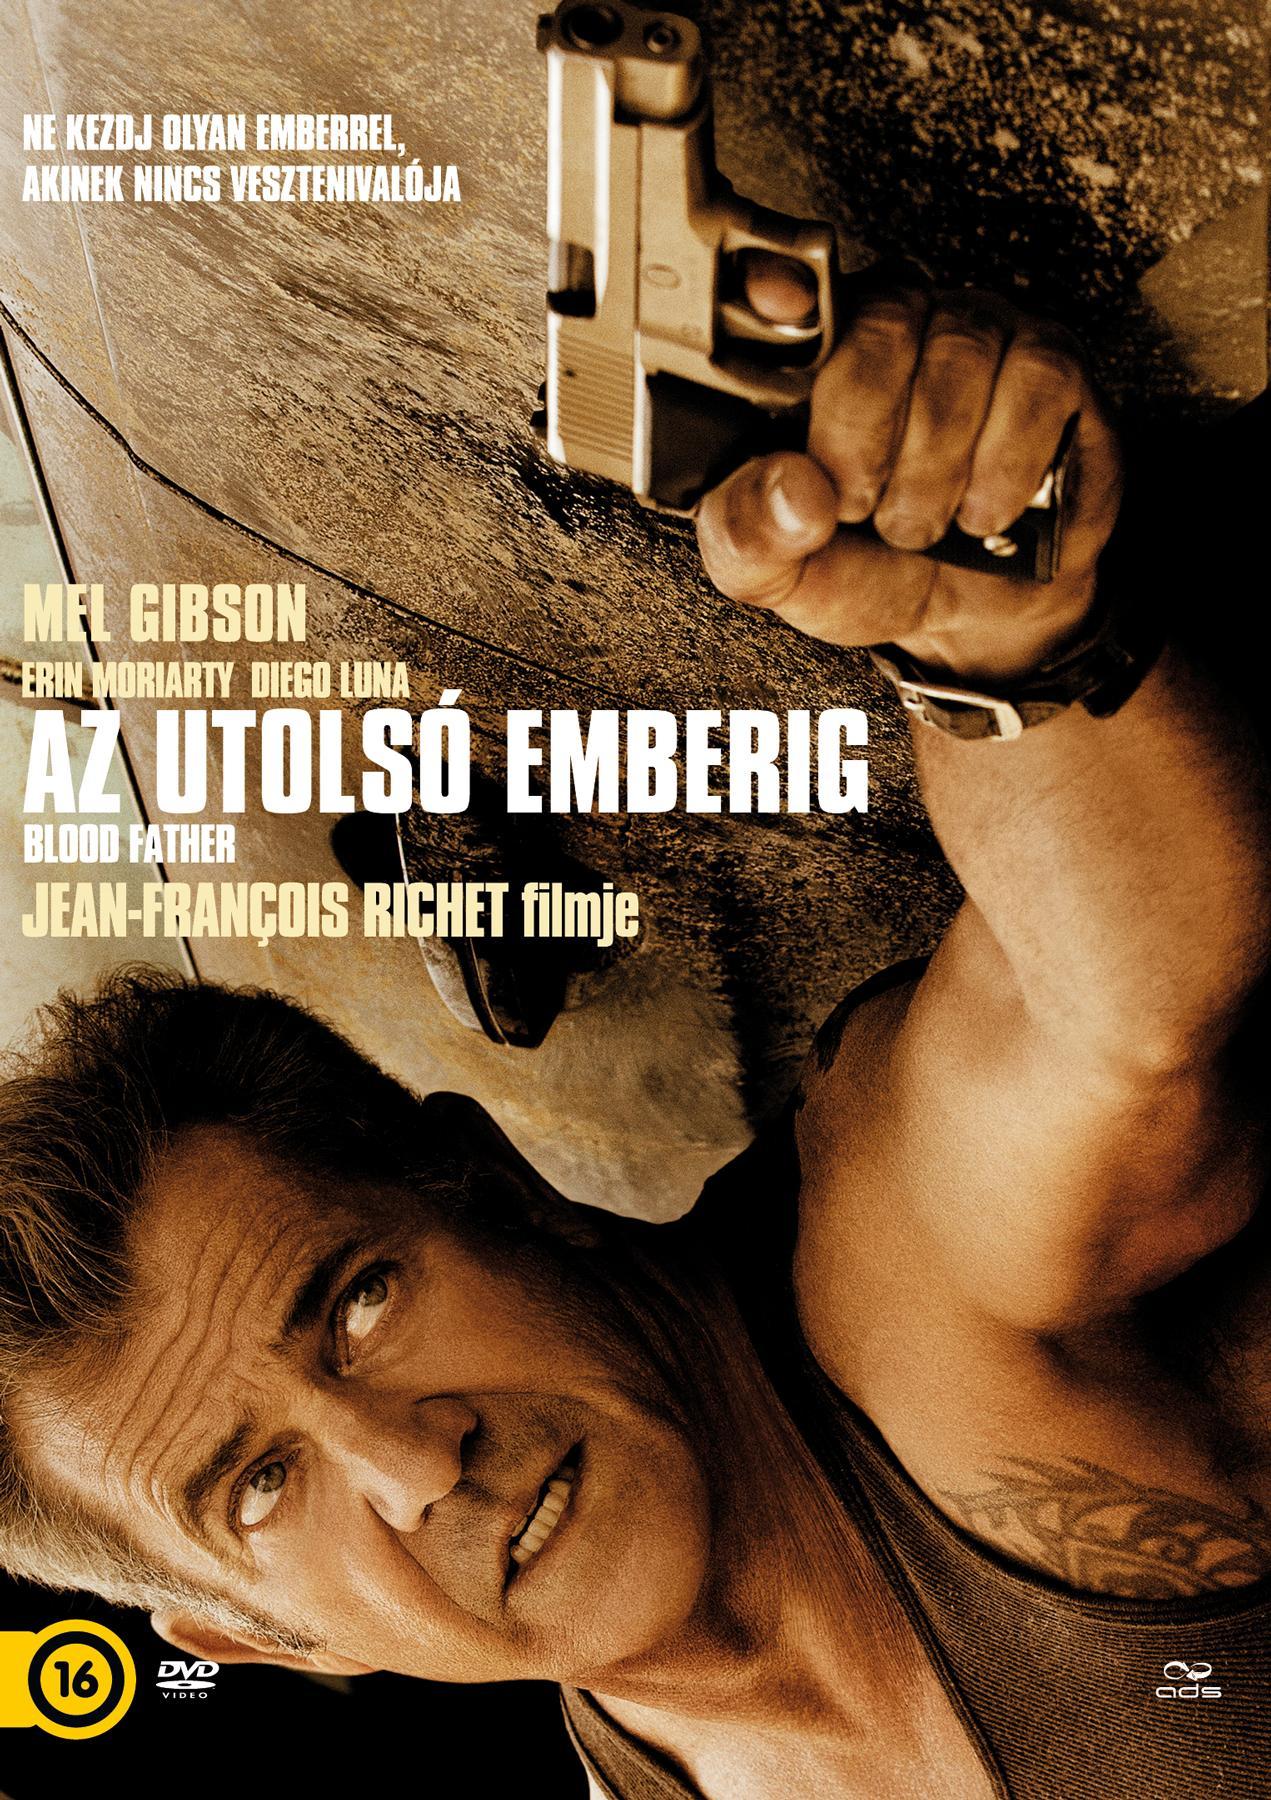 AZ UTOLSÓ EMBERIG - DVD -